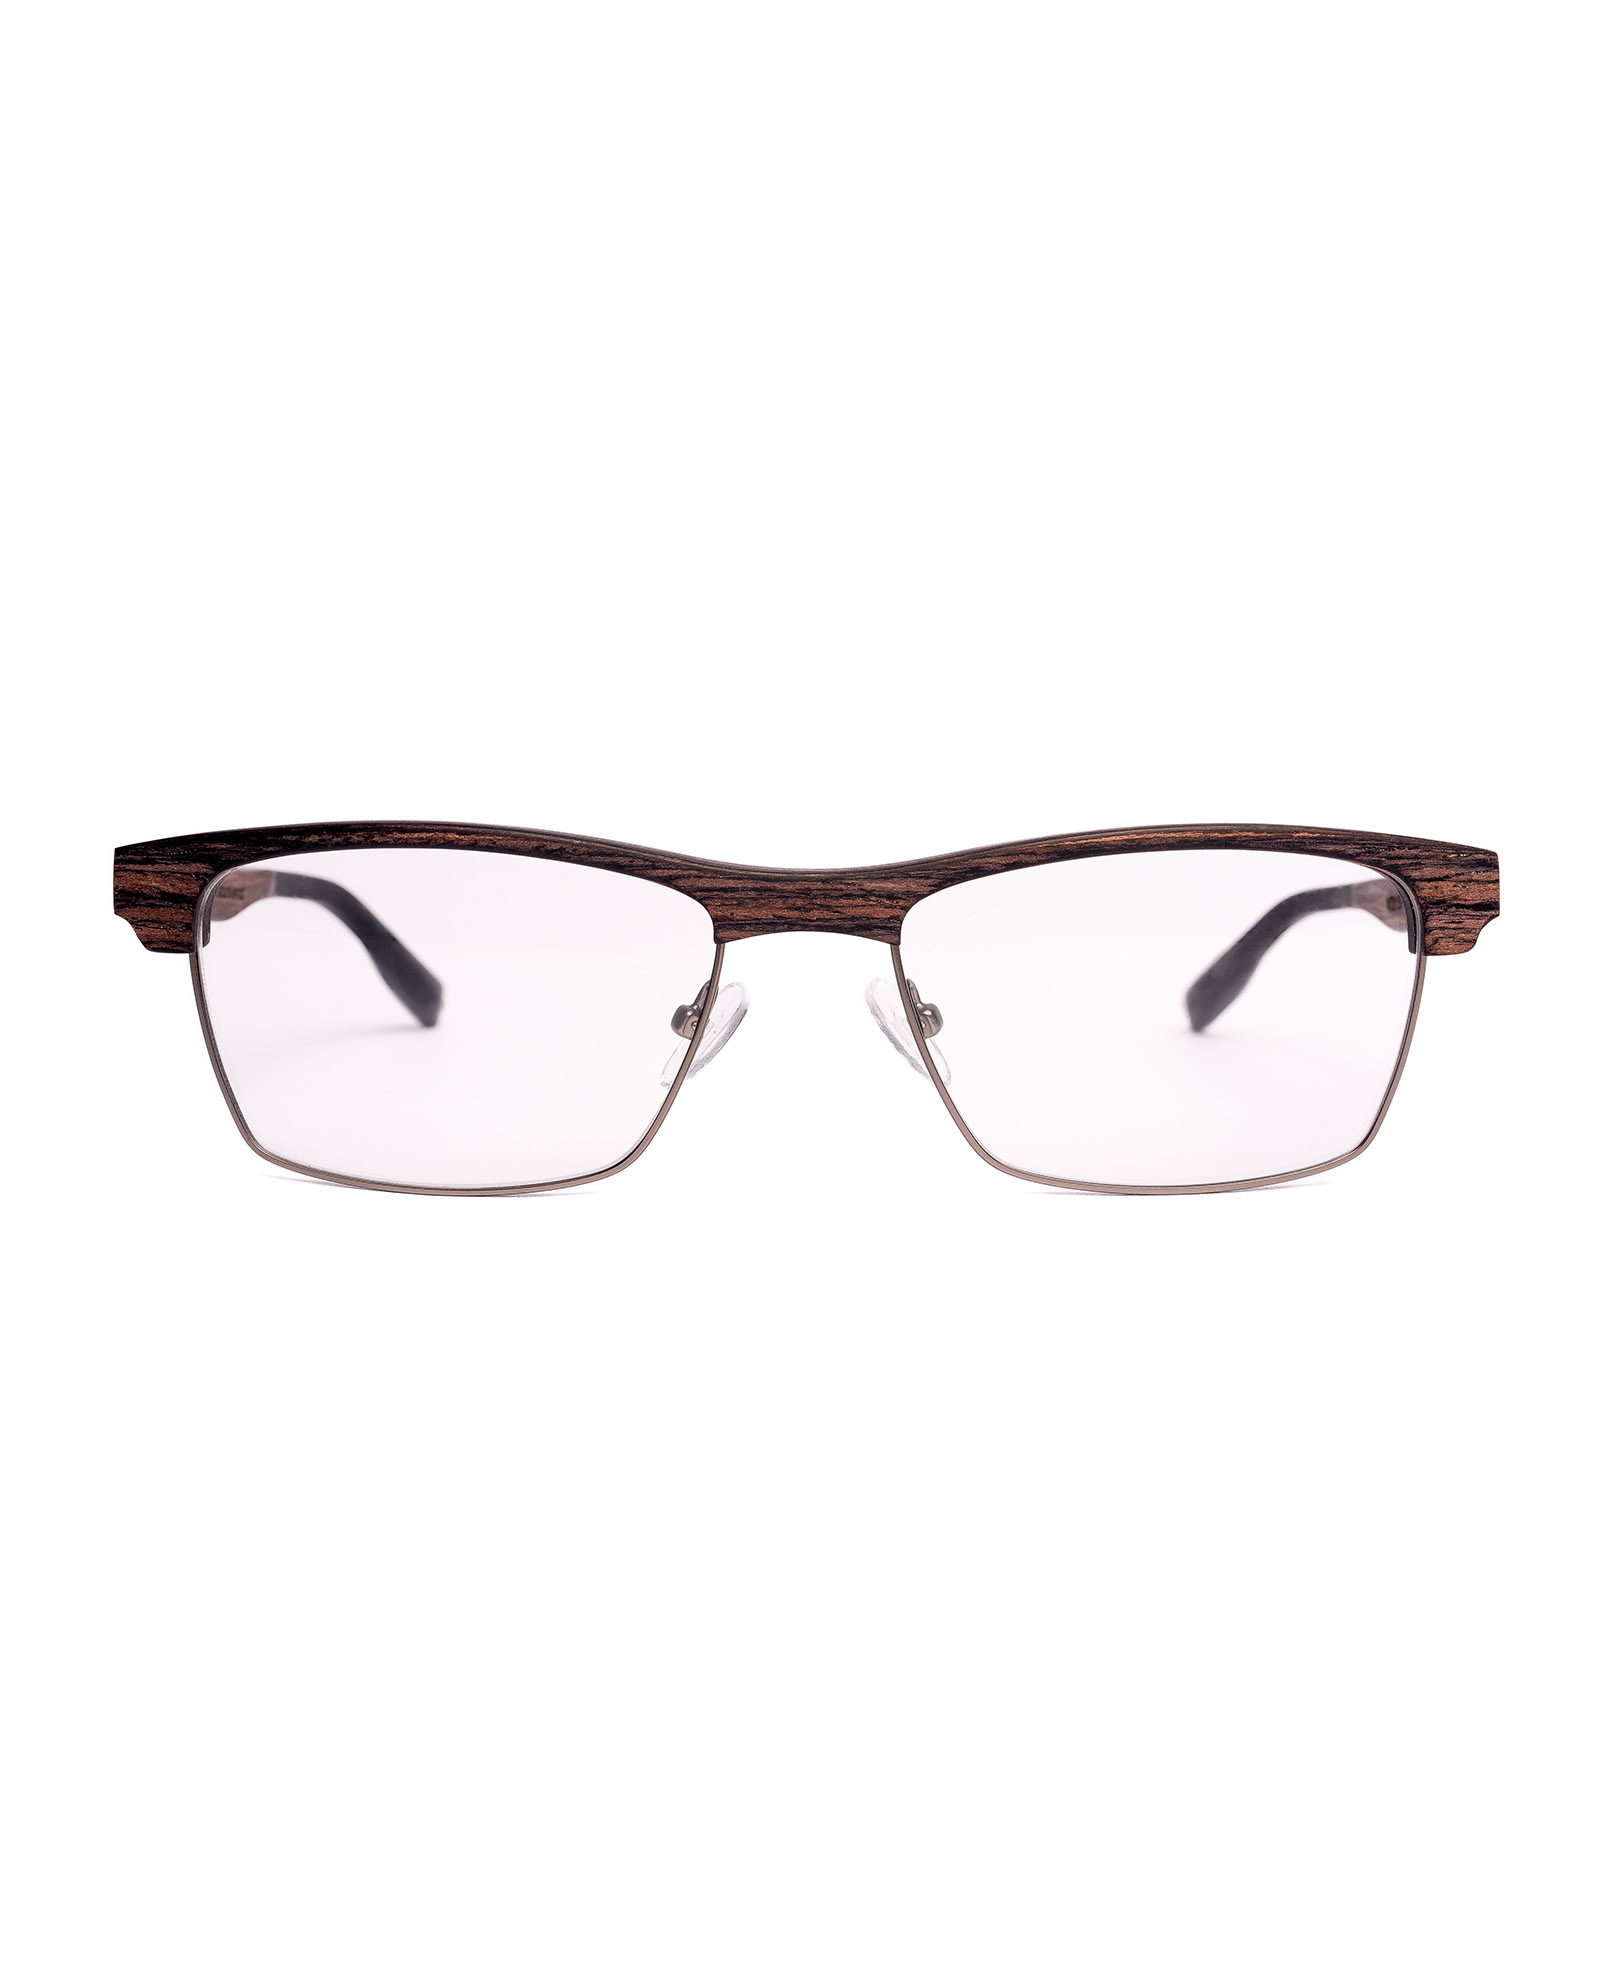 26d7071967 Berlin Blur - Wooden Glasses - Woodiu